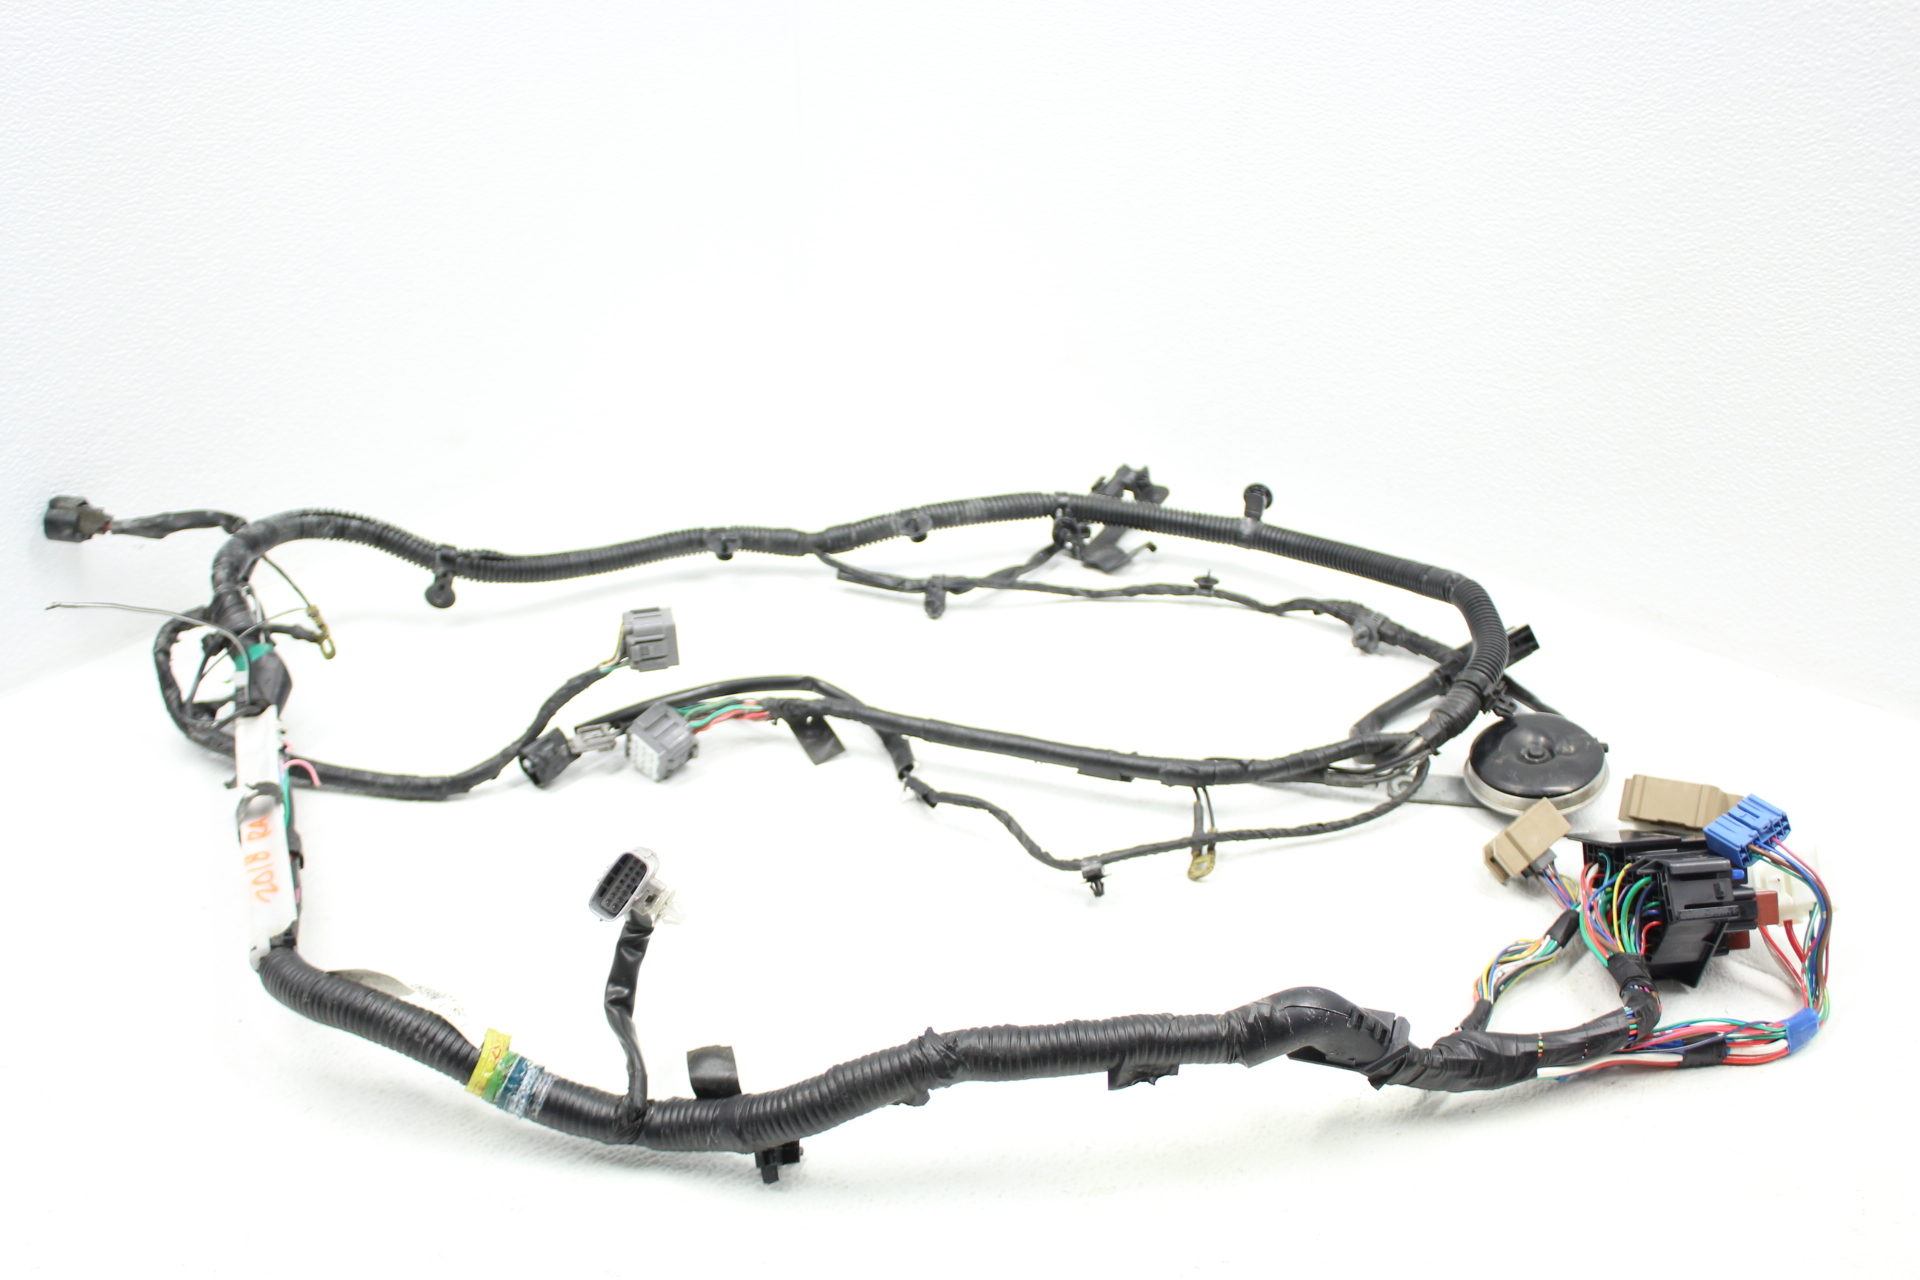 Diagram Subaru Wrx Sti Ecu Pinout Diagrams